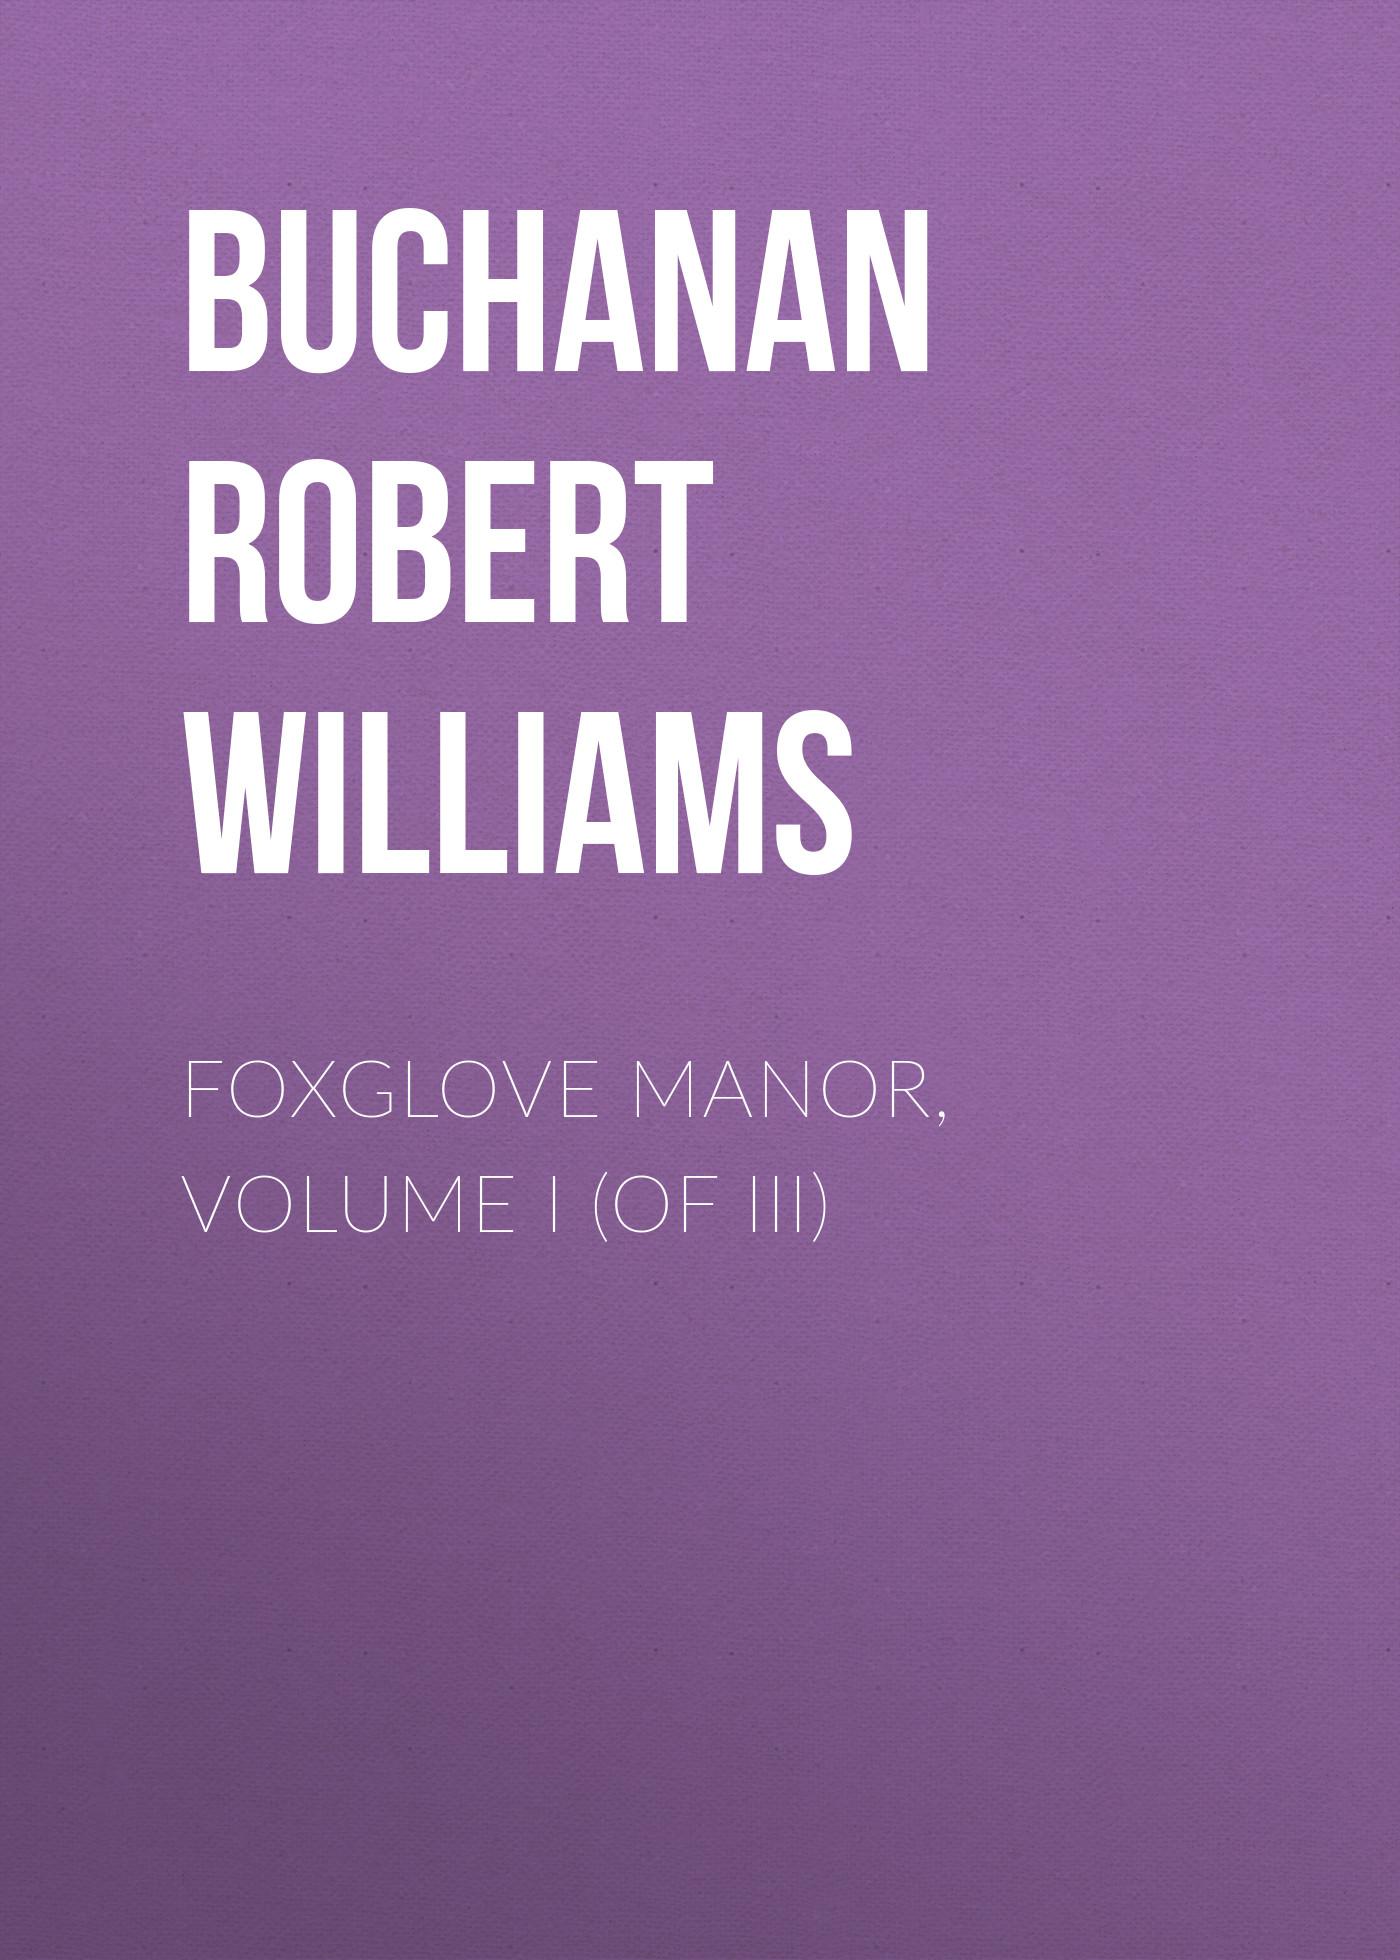 Buchanan Robert Williams Foxglove Manor, Volume I (of III)